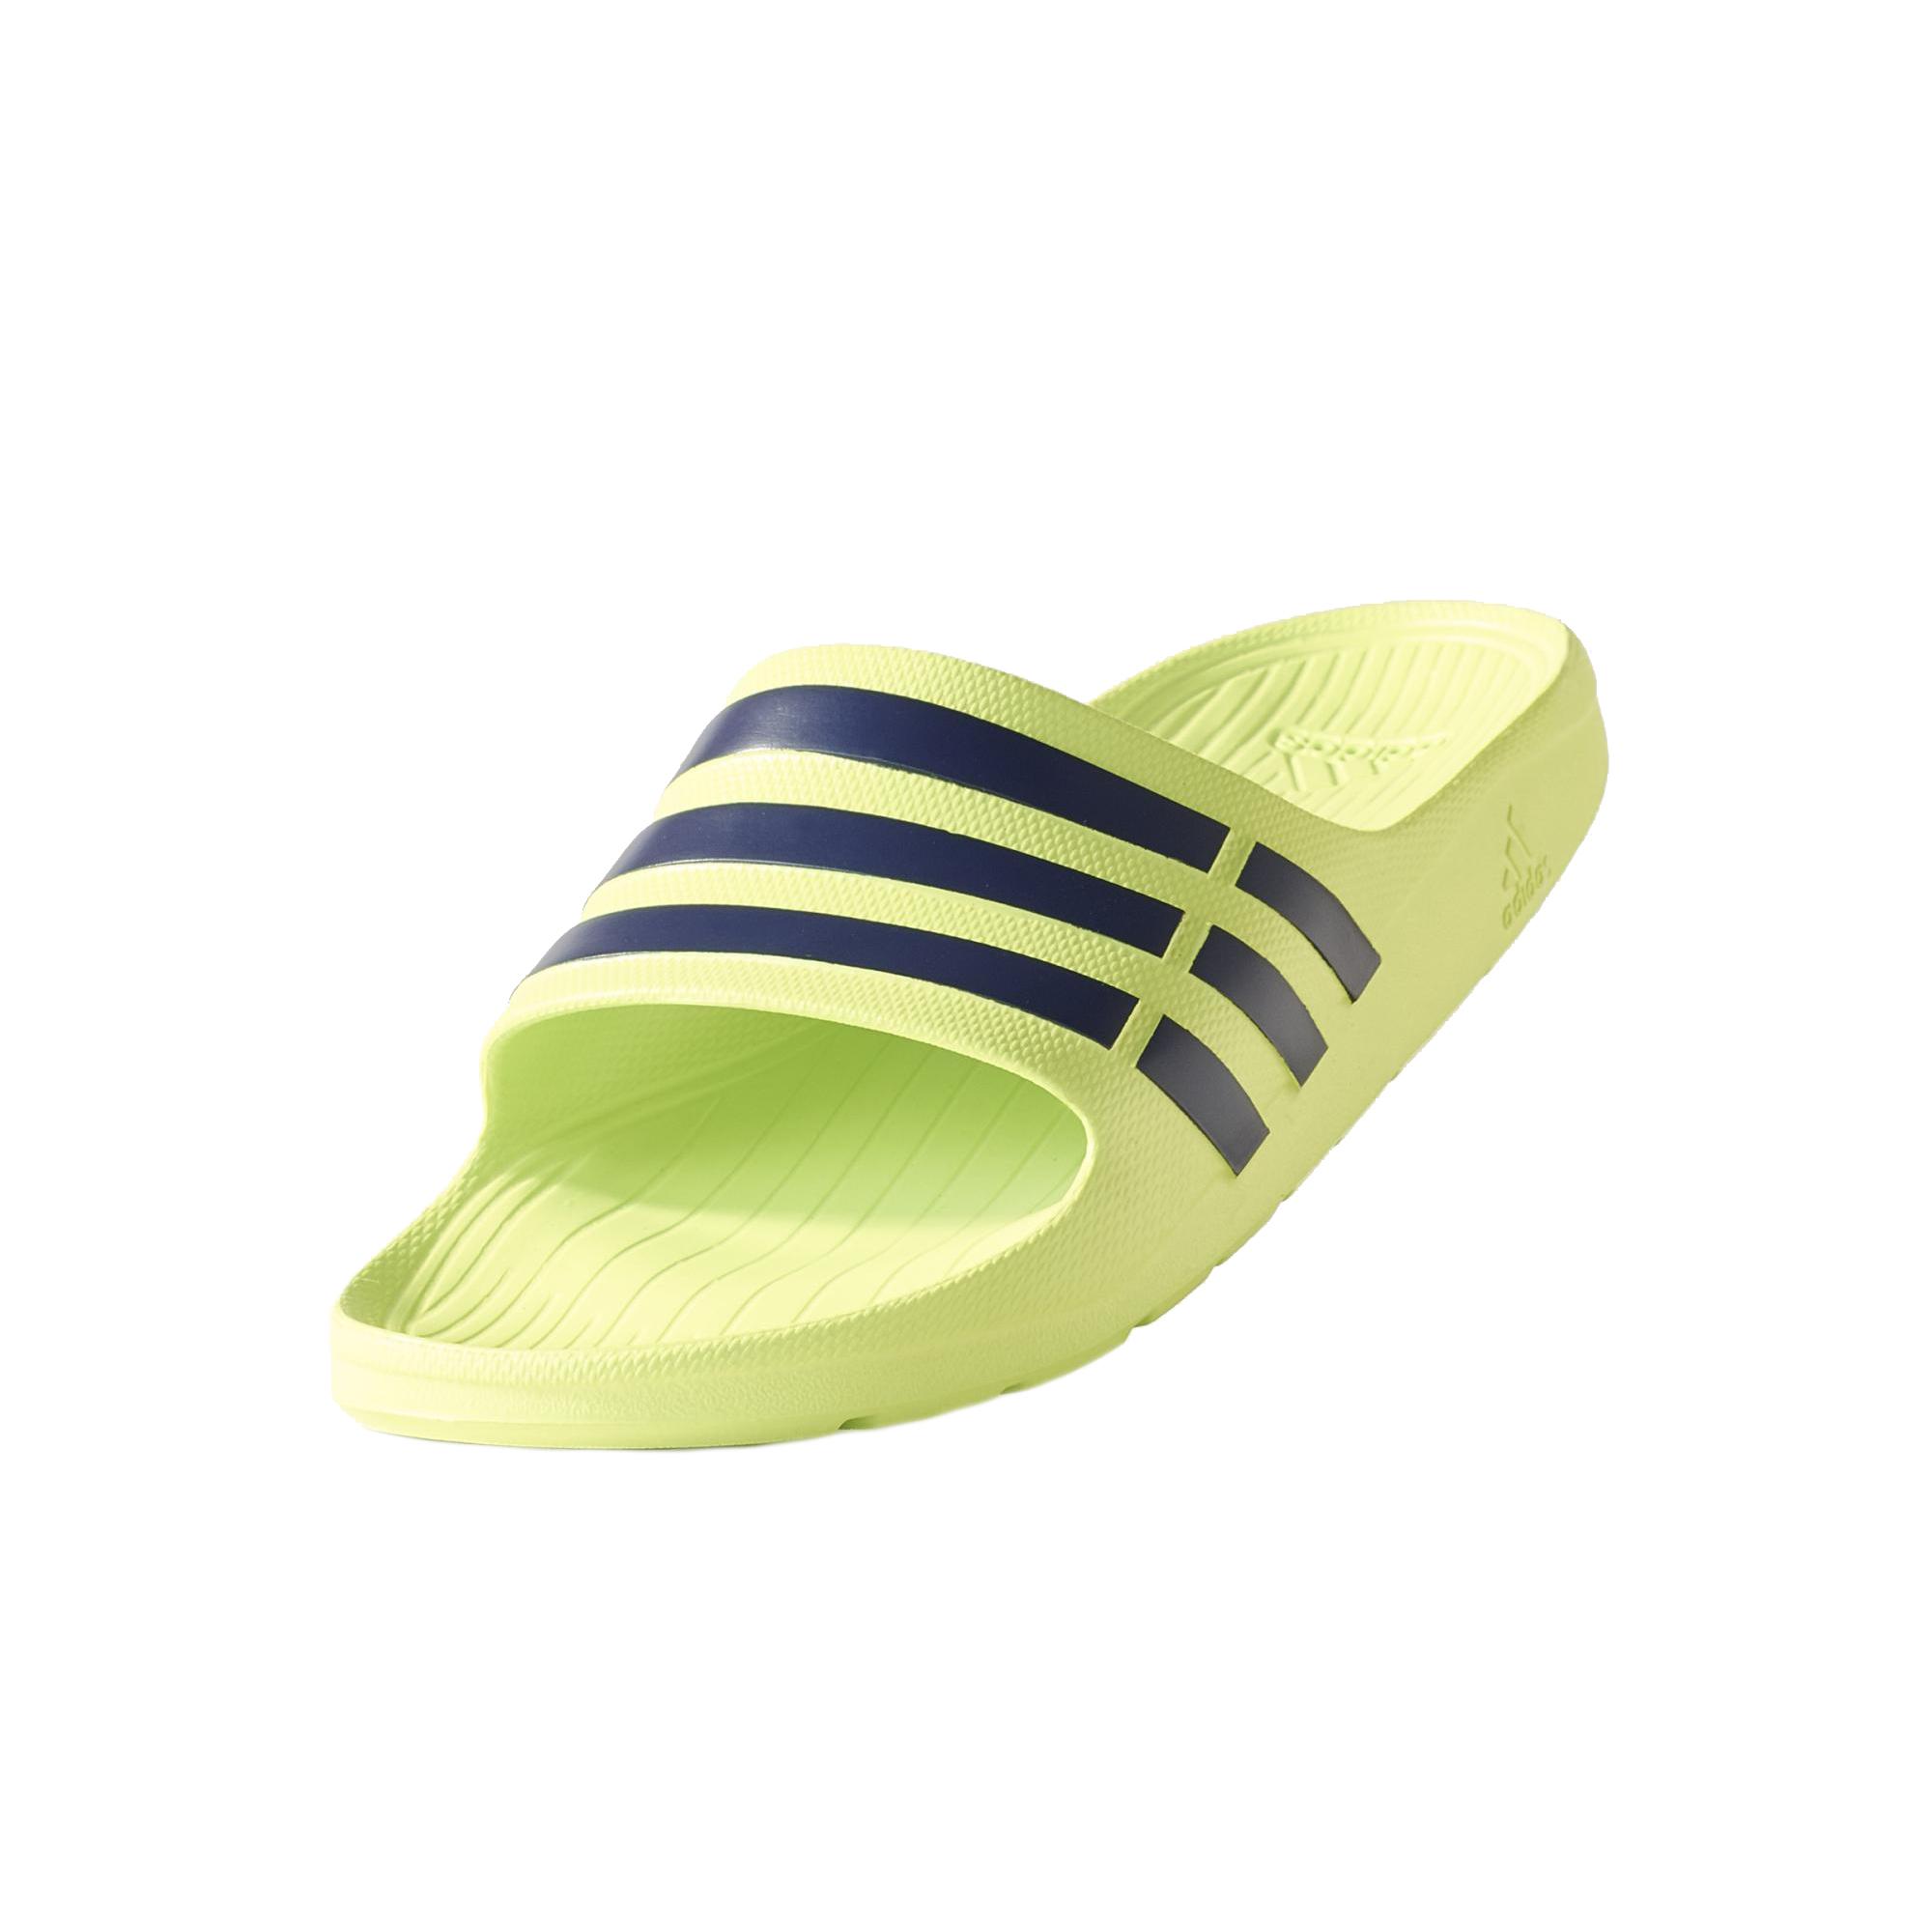 watch 84053 7e125 Chanclas Adidas Duramo Slide (amarillosolarmarino)